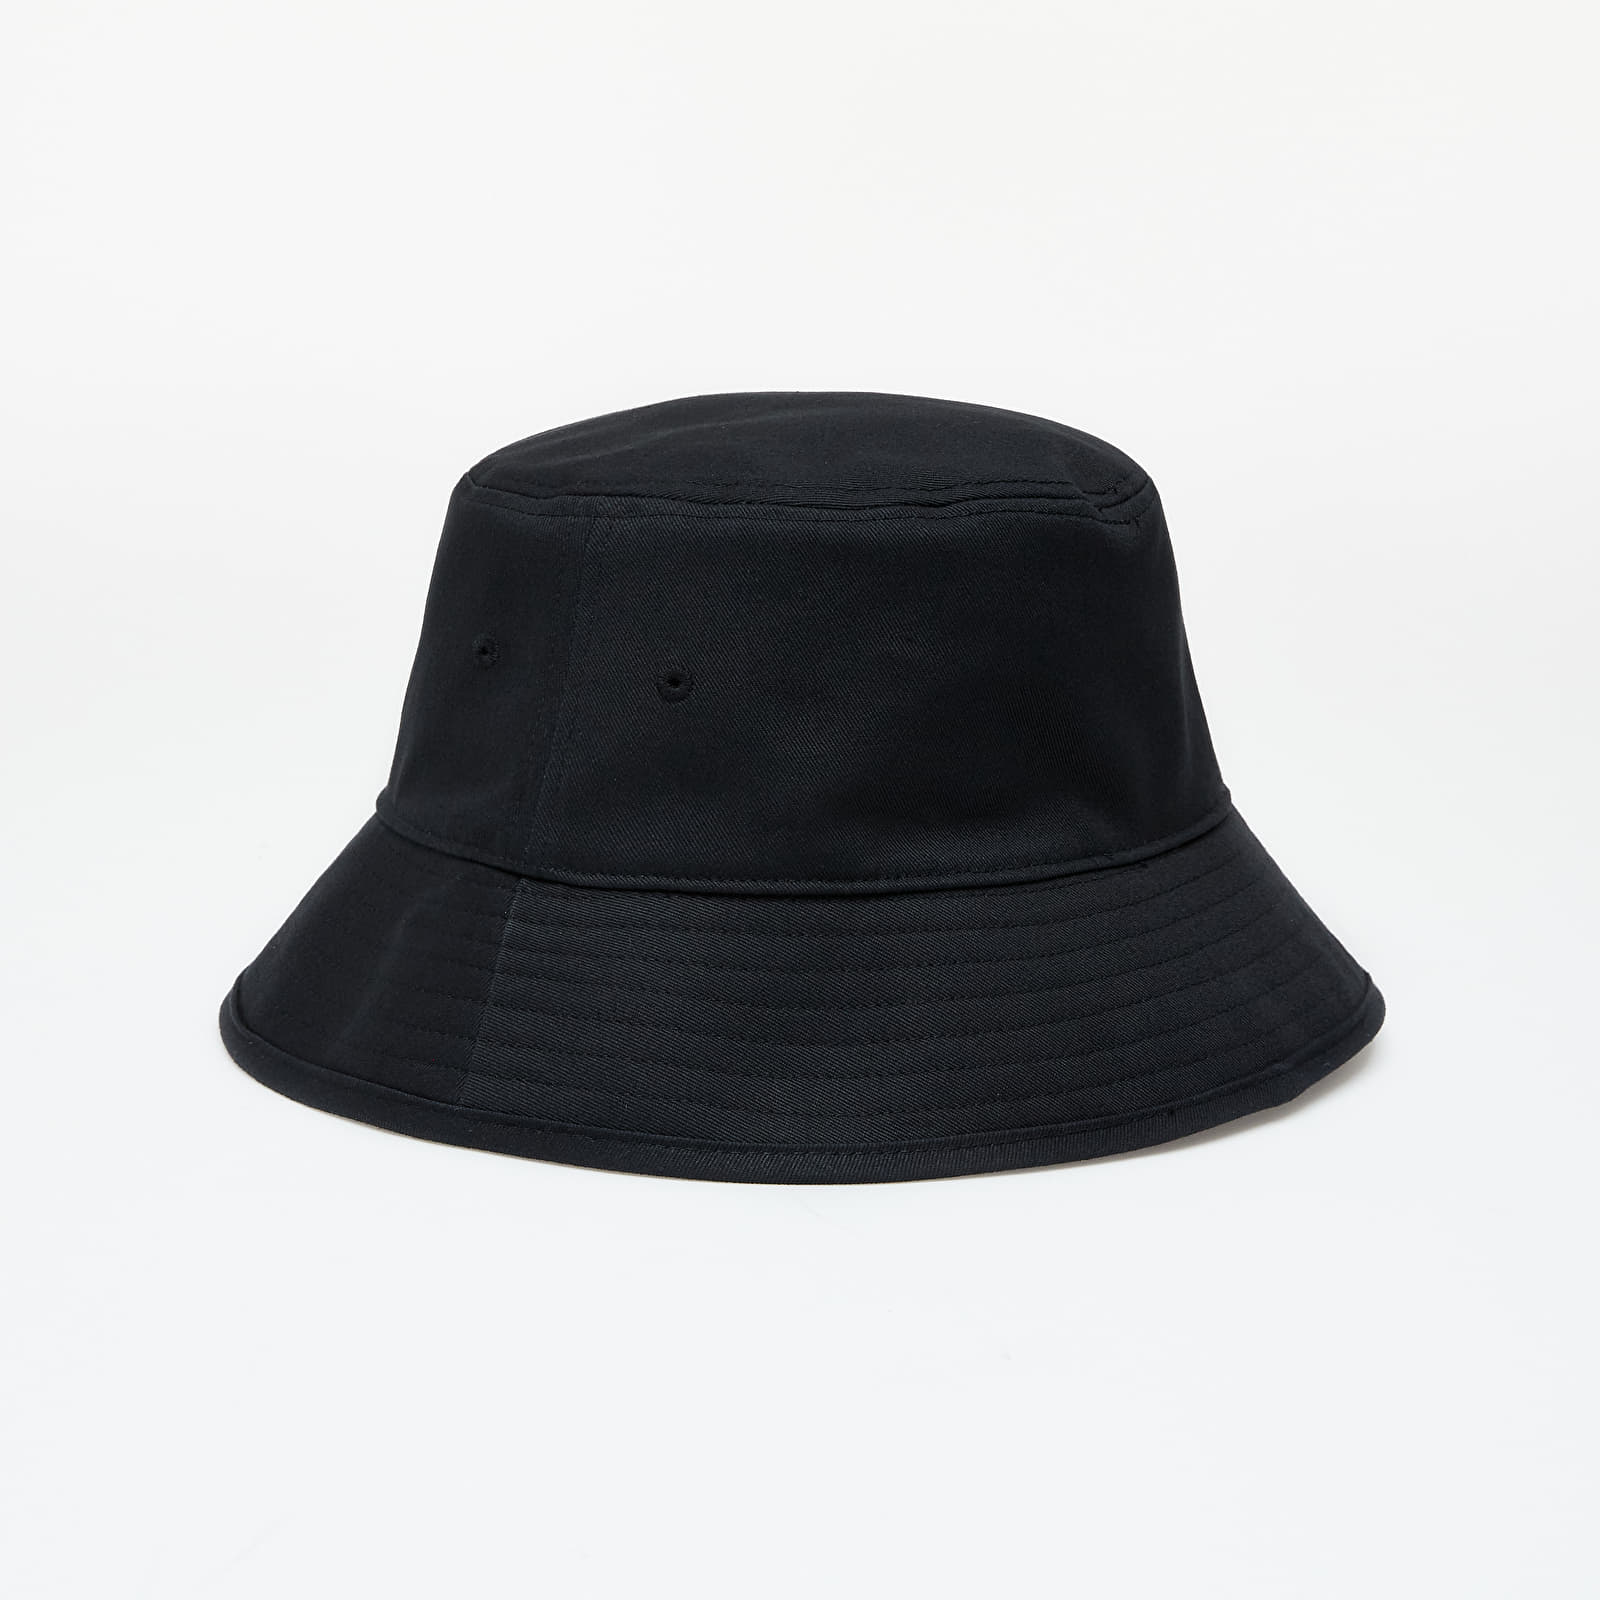 adidas Adicolor Trefoil Bucket Hat Black/ White OSFM